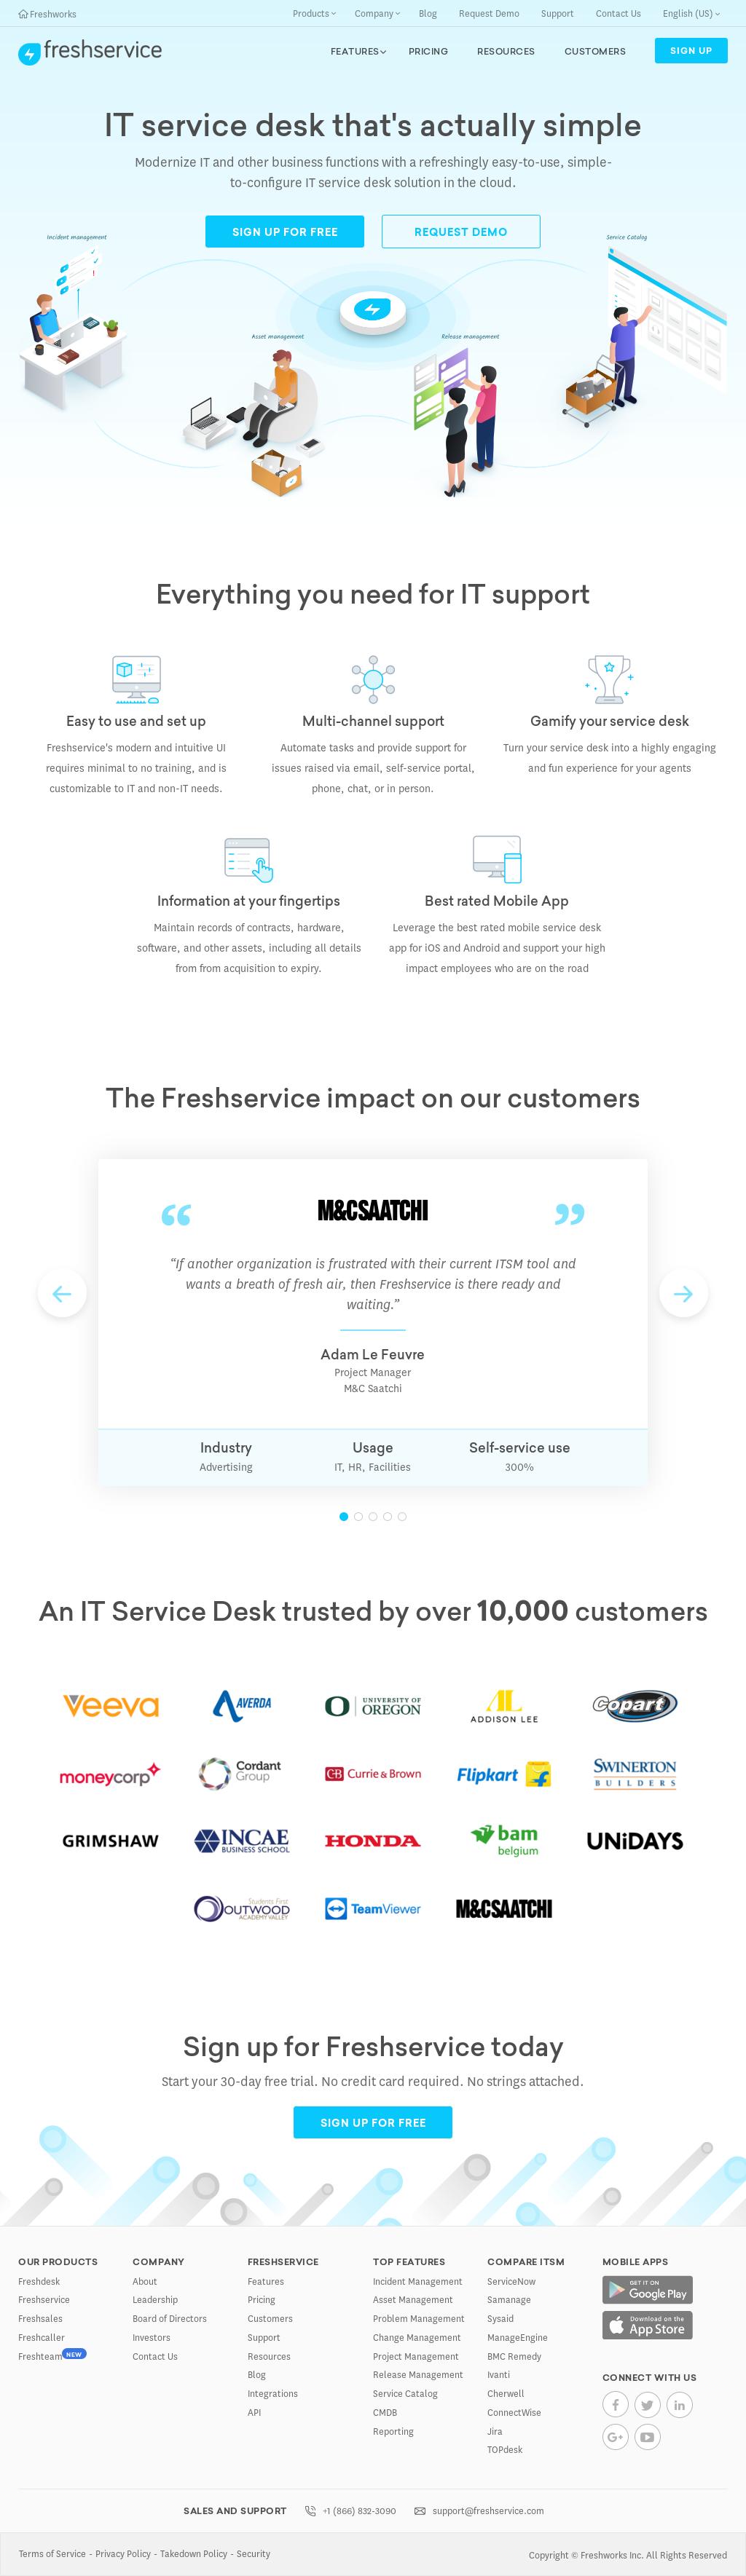 Freshservice Website History